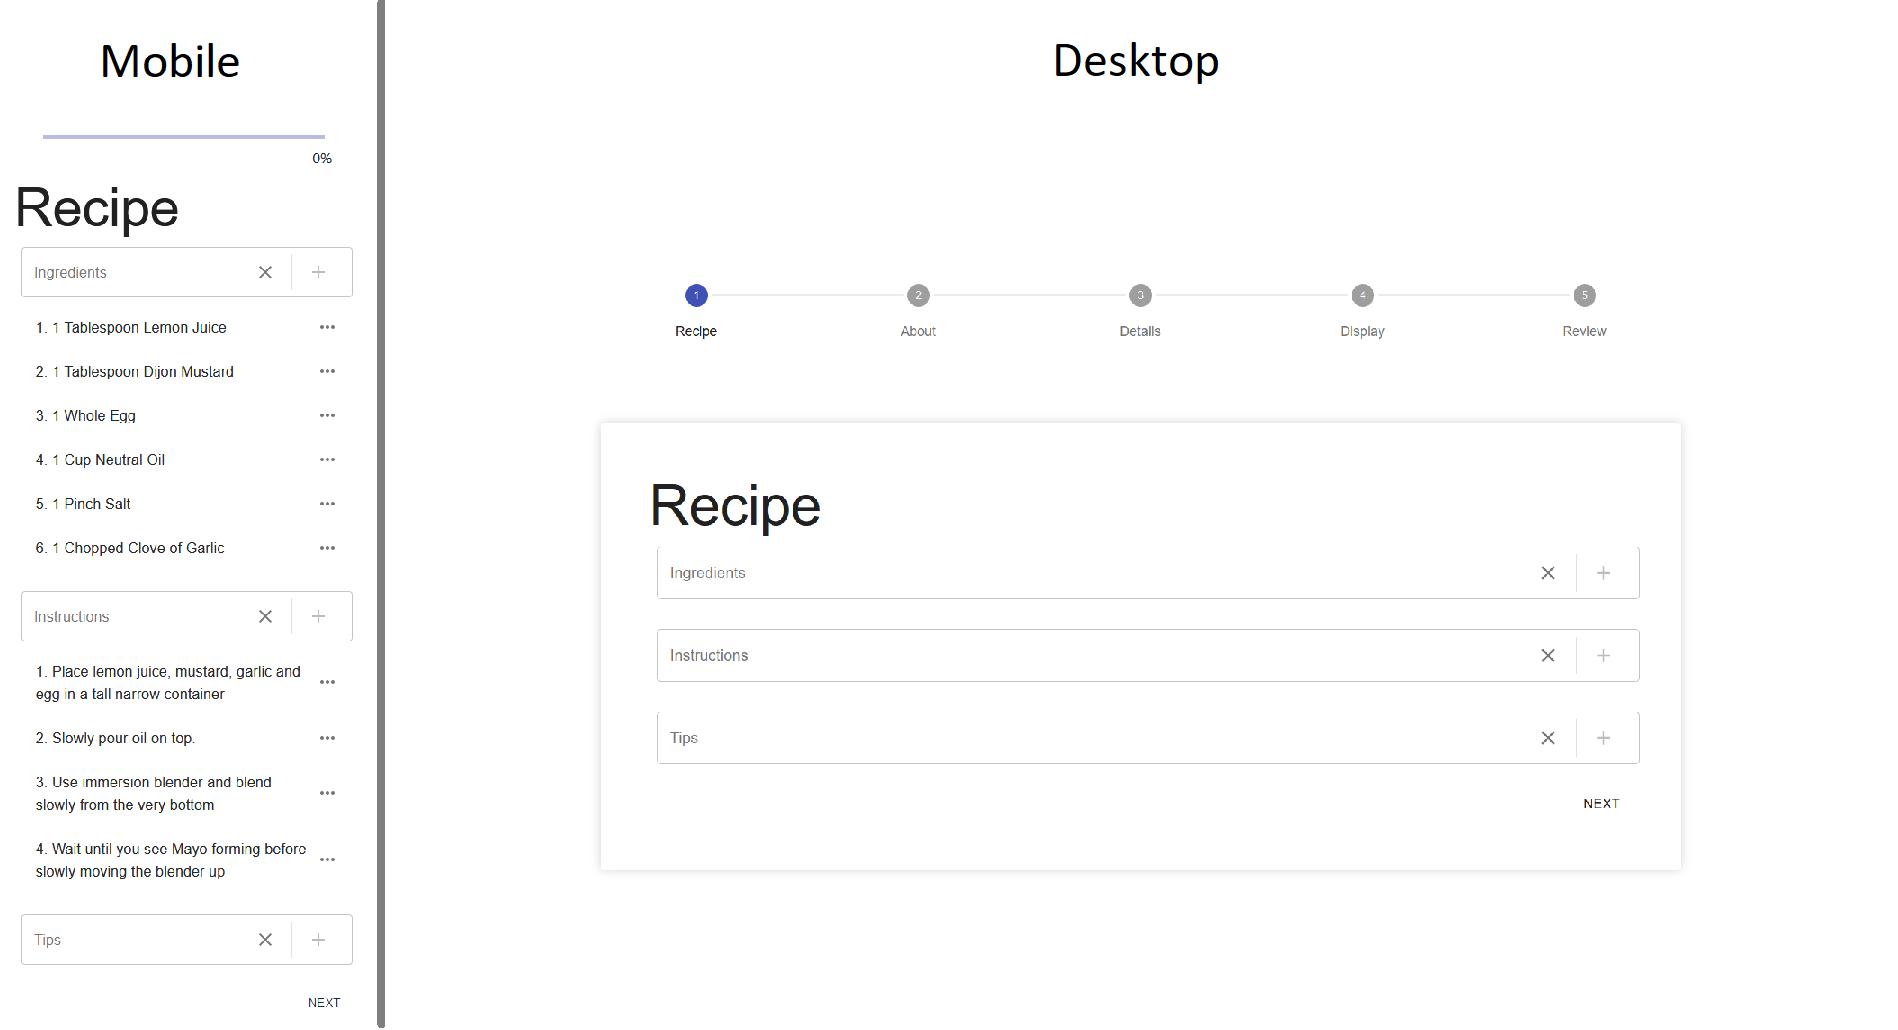 Mobile & Desktop Sample Image